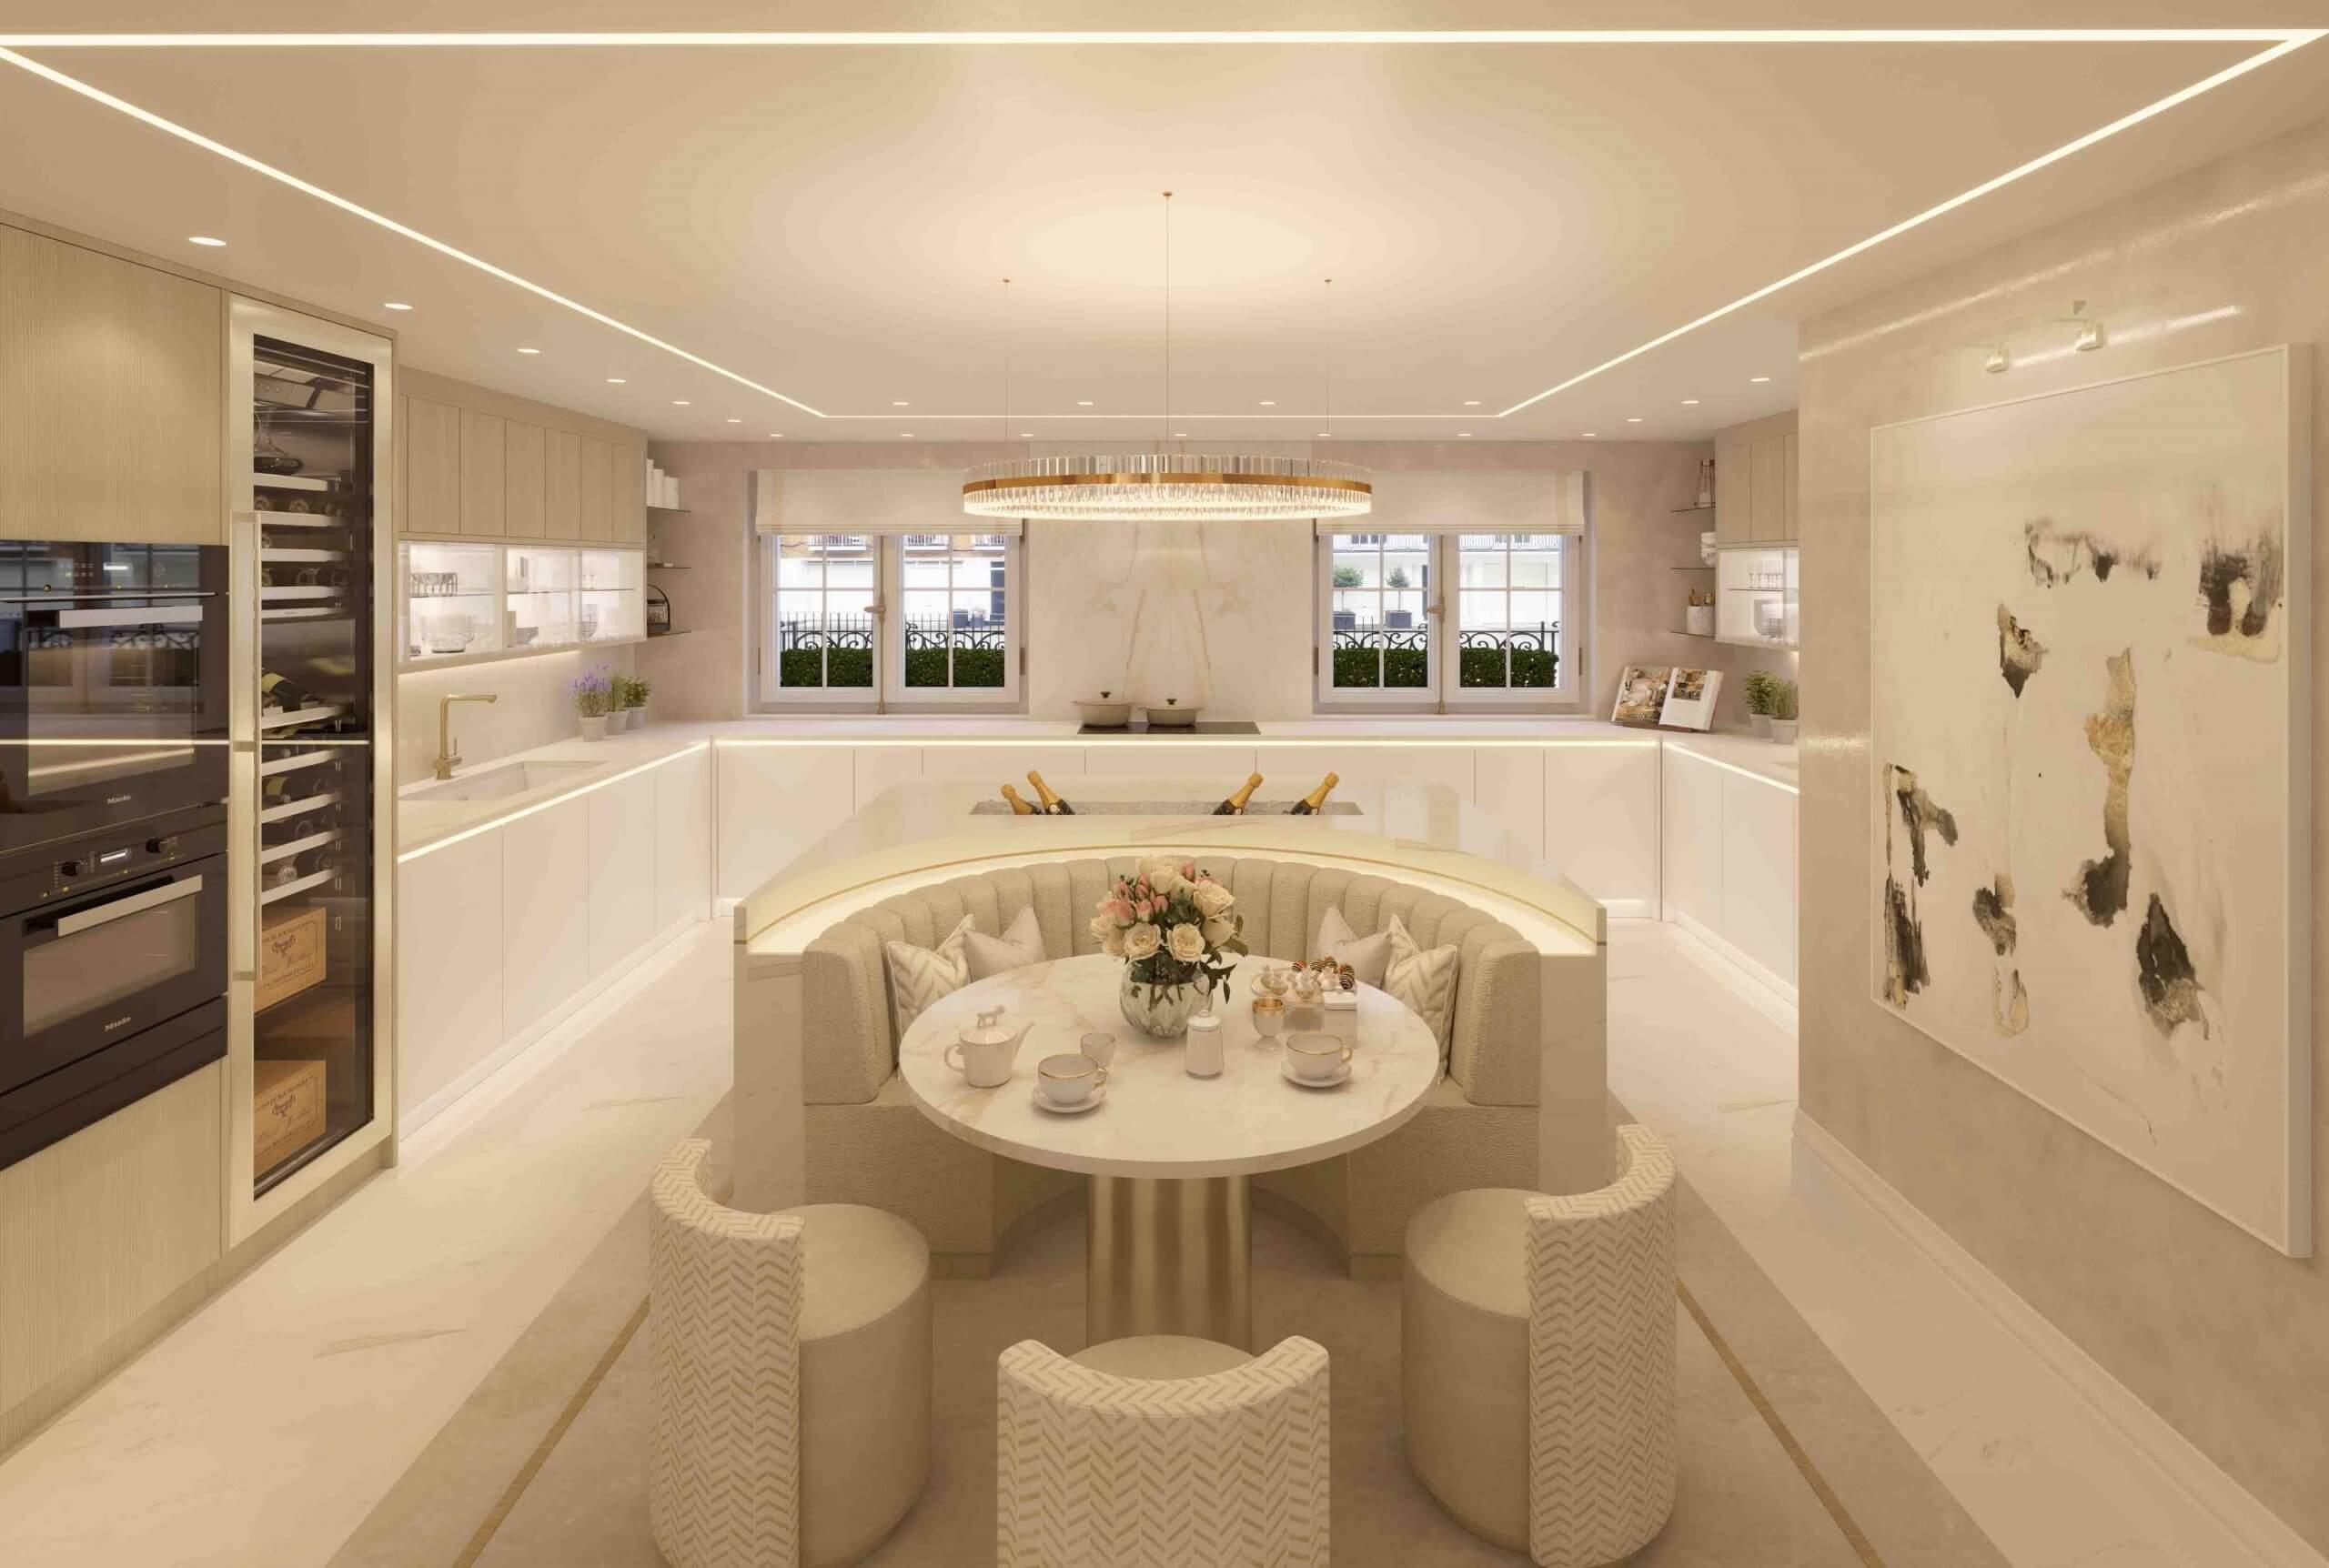 London House kitchen